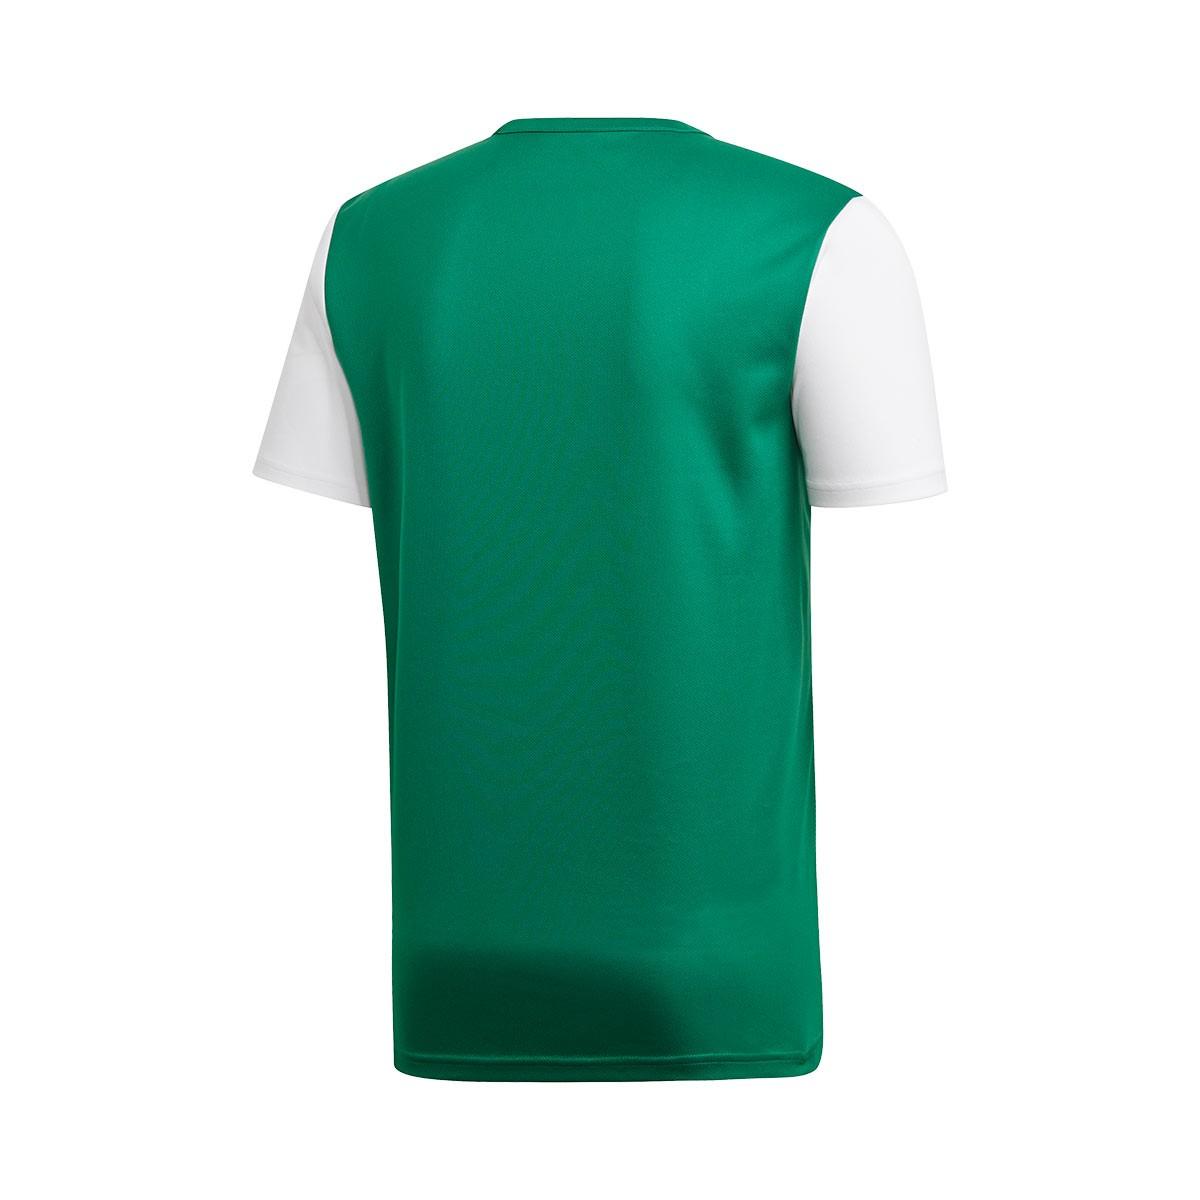 59d44b033 Jersey adidas Estro 19 m/c Bold green-White - Tienda de fútbol Fútbol  Emotion